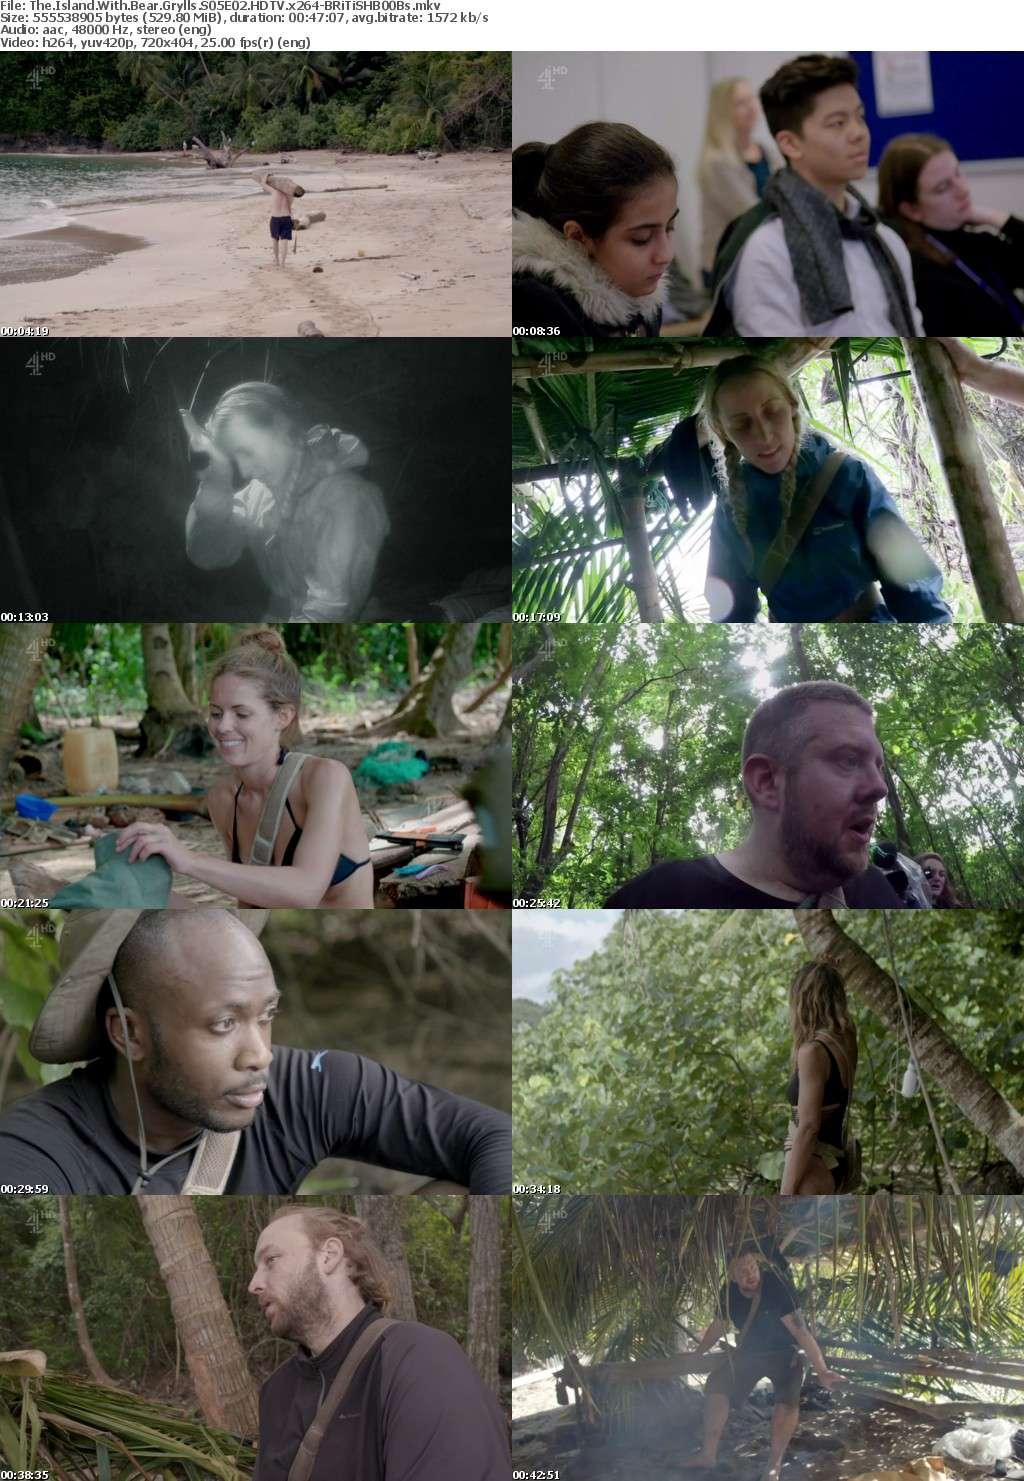 The Island With Bear Grylls S05E02 HDTV x264-BRiTiSHB00Bs